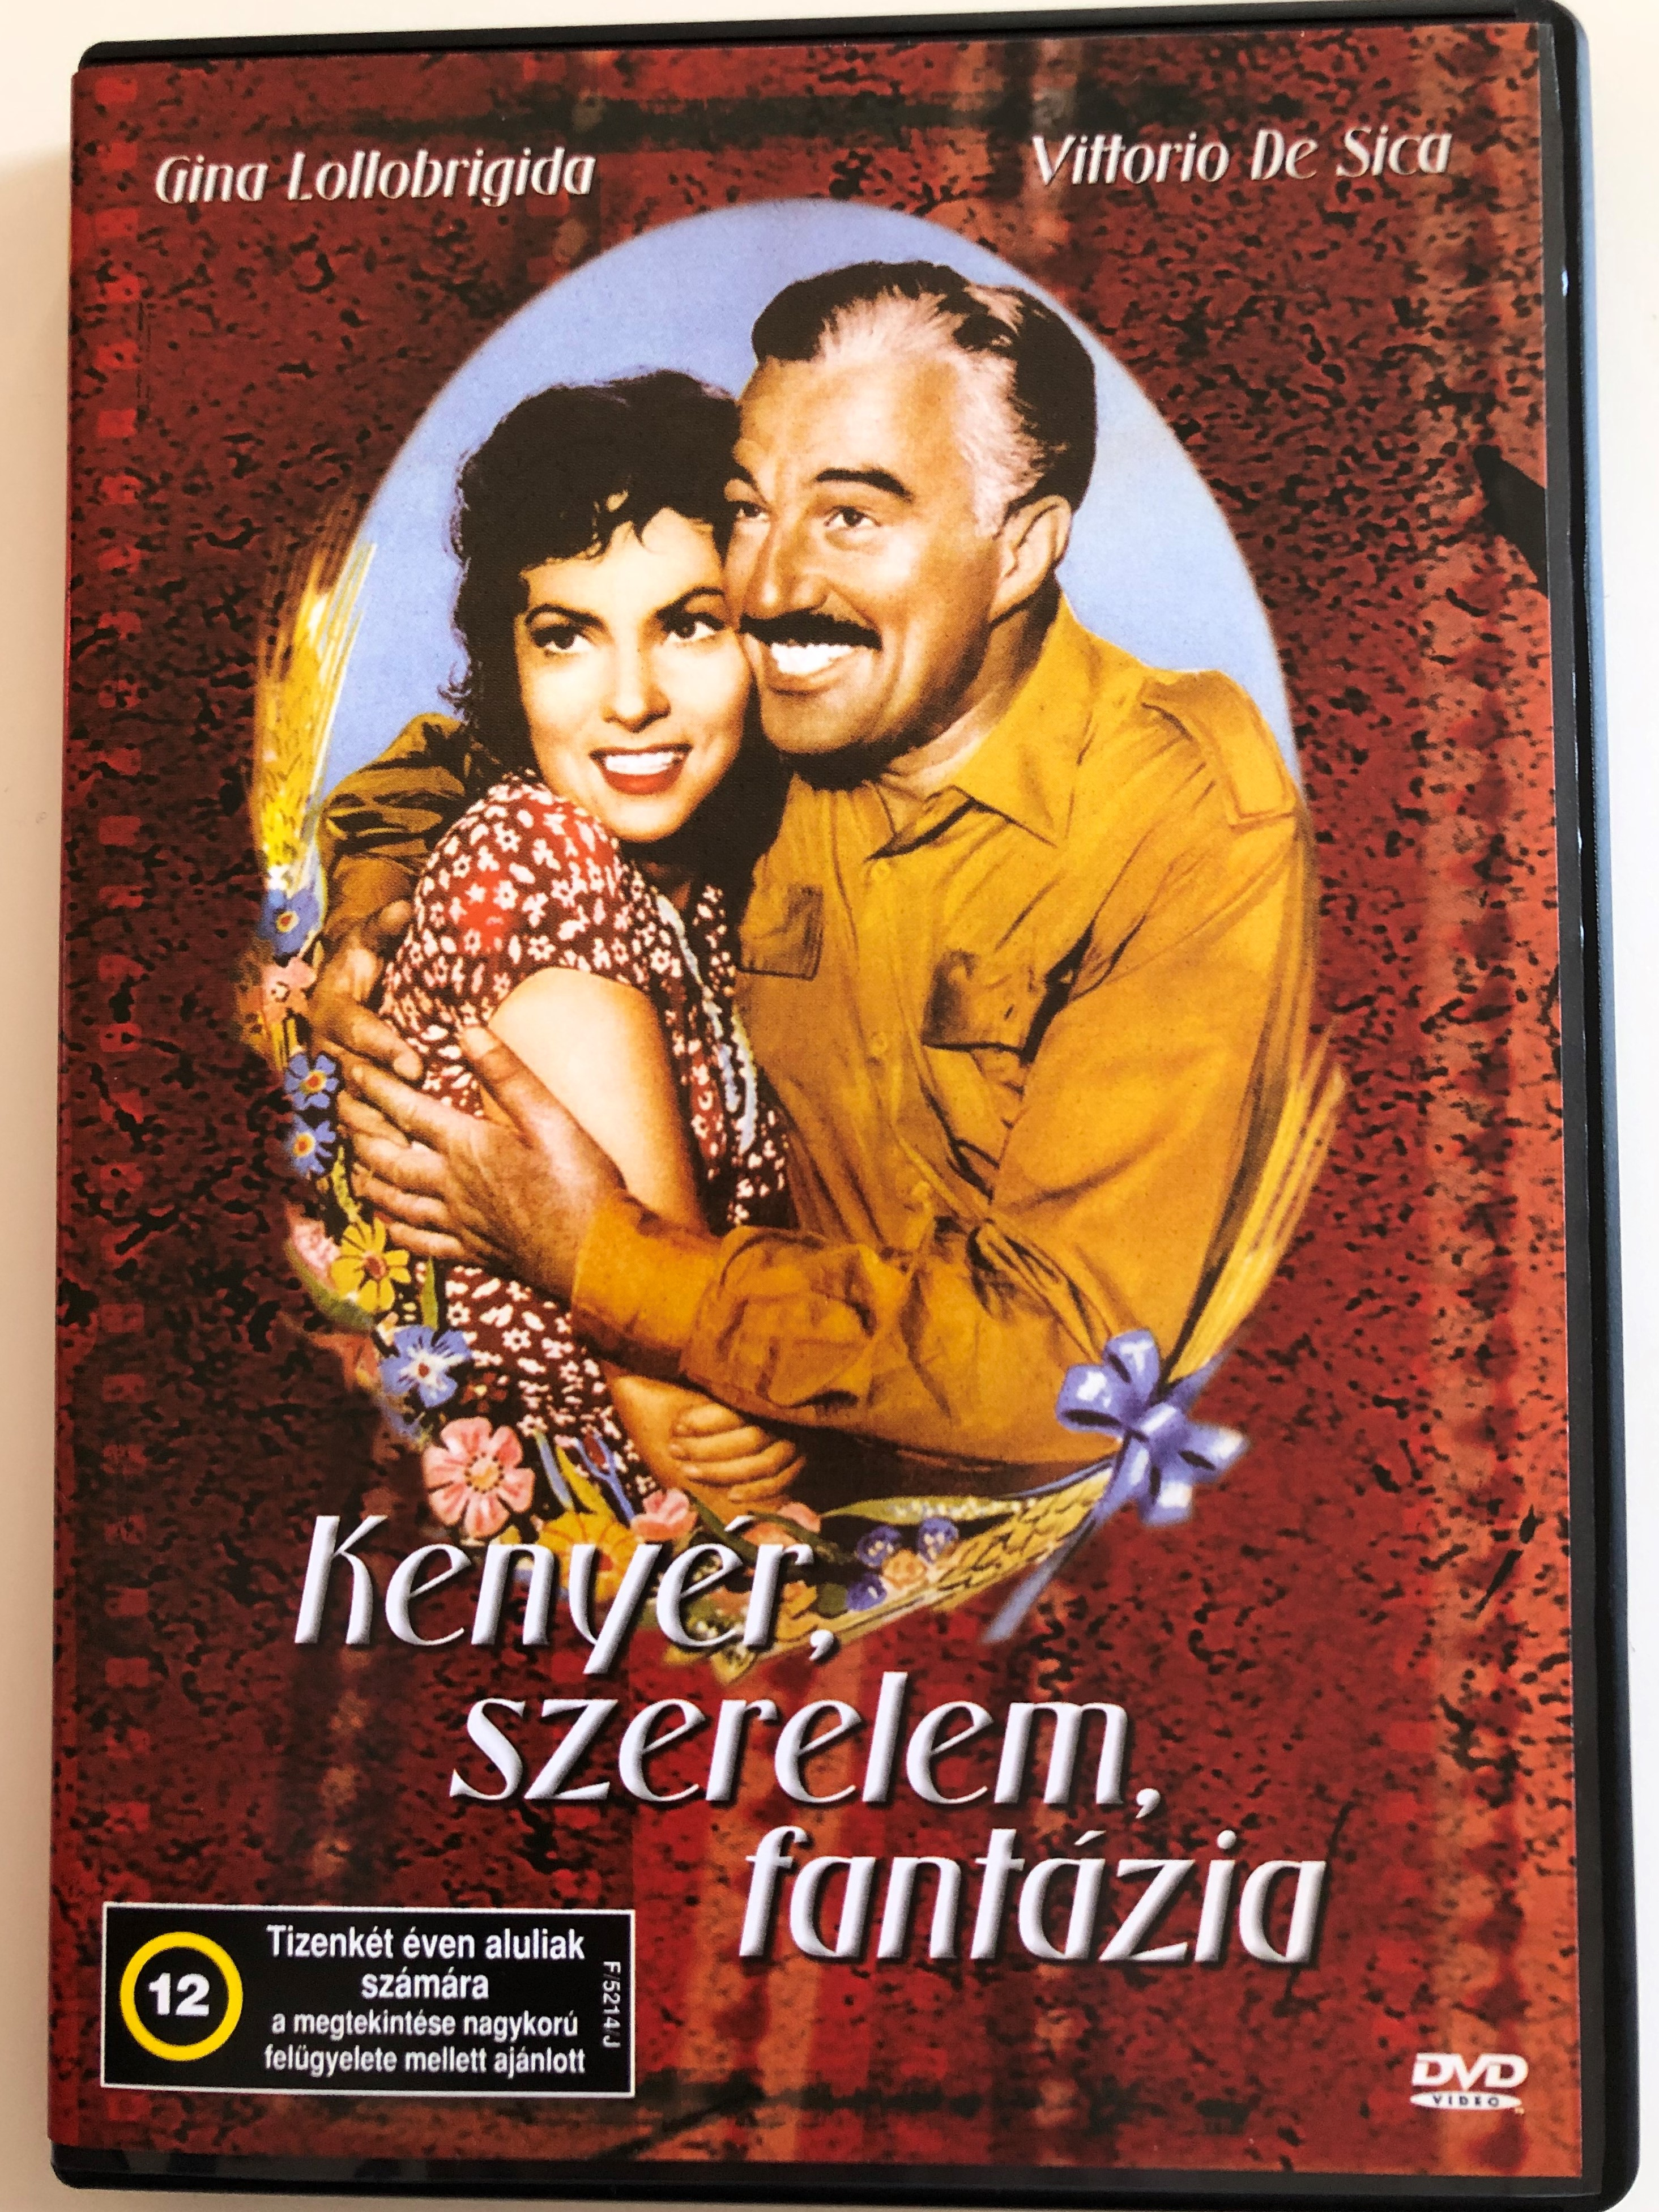 -pane-amore-e-fantasia-dvd-1953-keny-r-szerelem-fant-zia-1.jpg